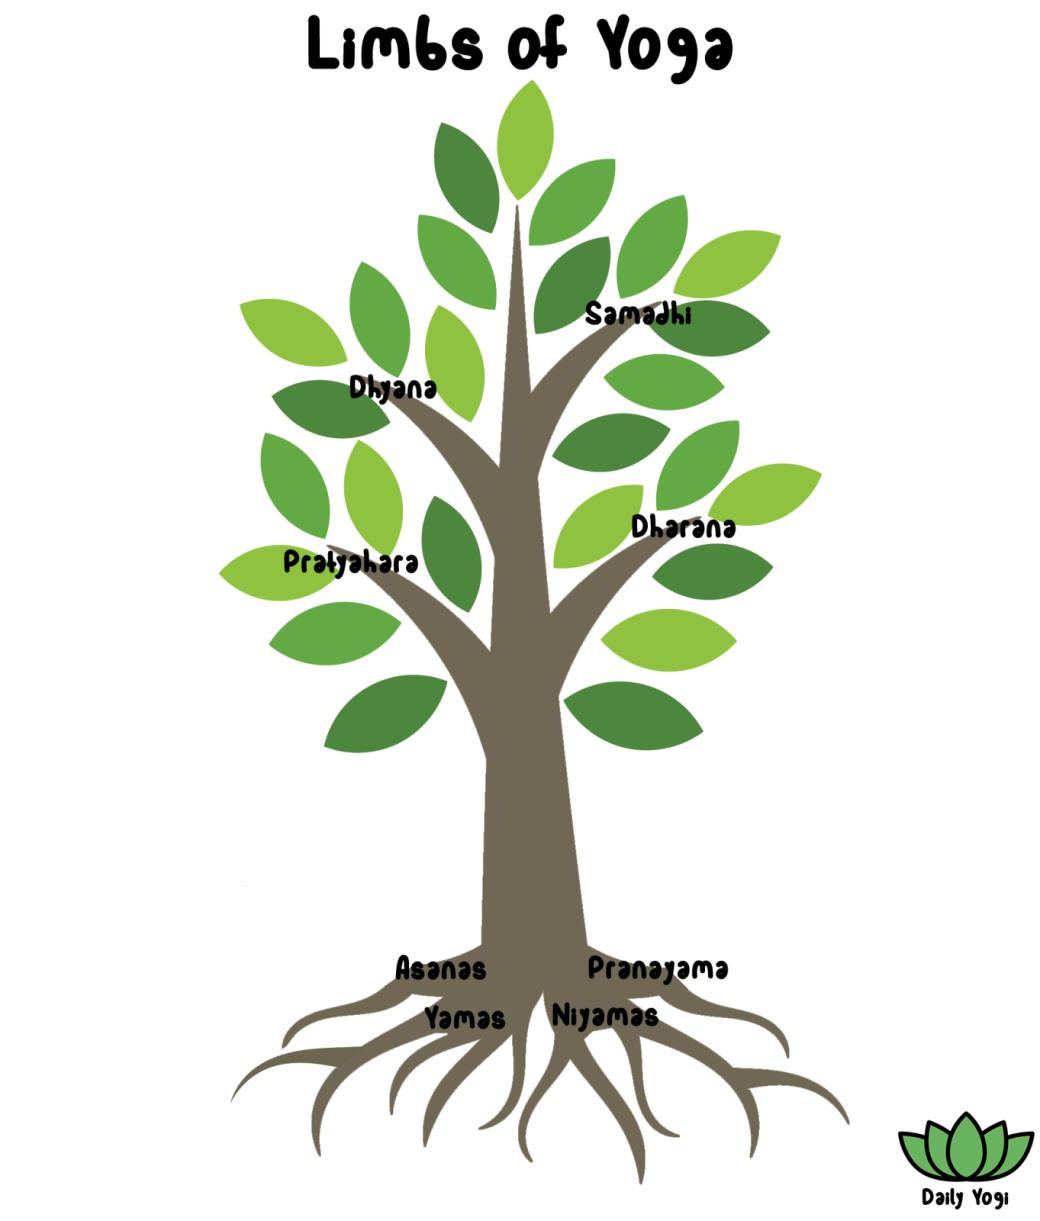 Daily Yogi - brown tree trunk and green leaves showing upper and lower Limbs of Yoga - Yamas, Niyamas, Asanas, Pranayama, Pratyahara, Dharana, Dhyana, Ishvara Pranidhana